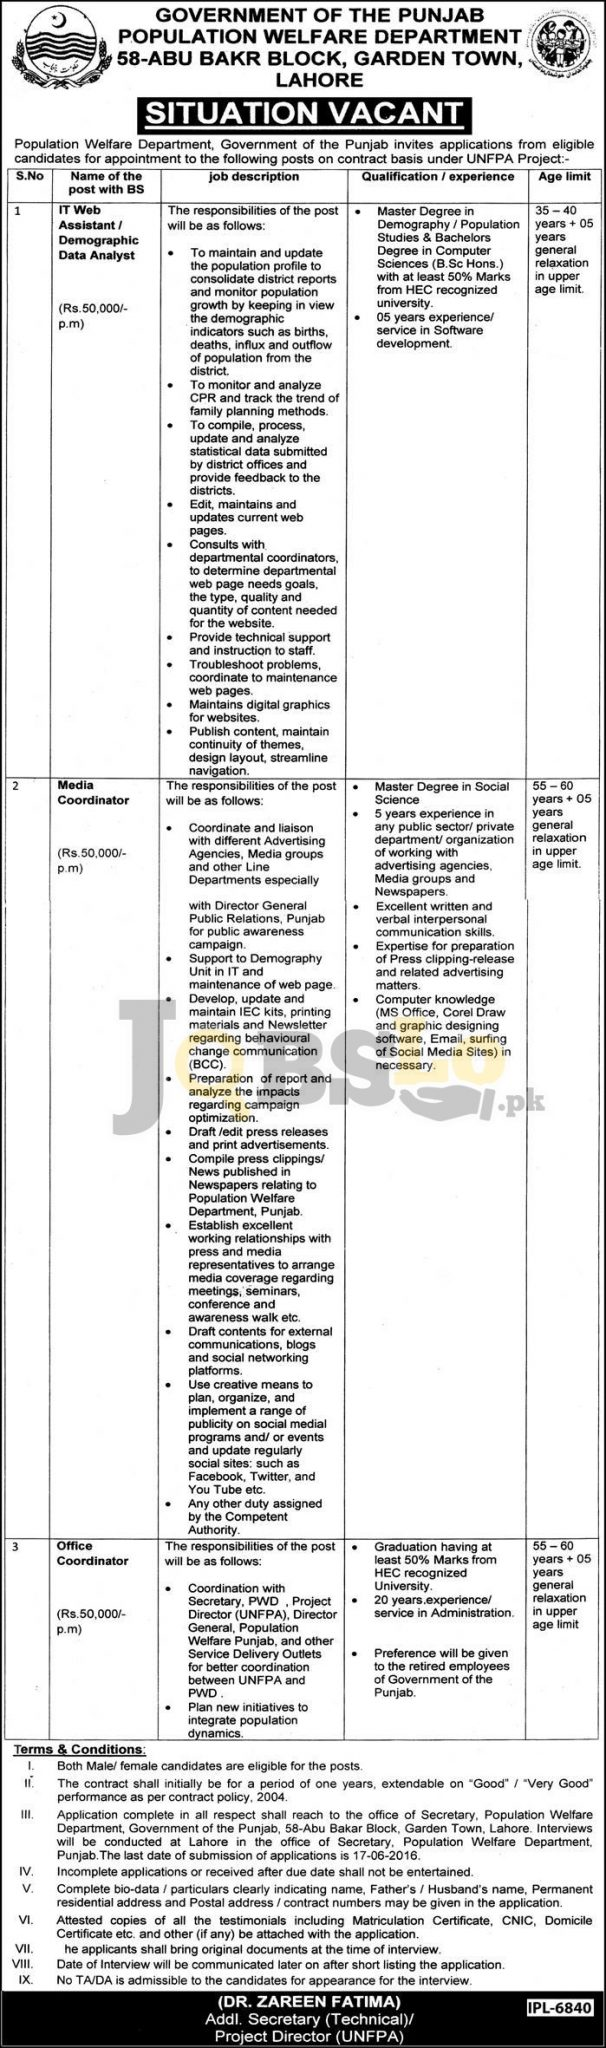 Punjab Population & Welfare Department Jobs 2016 For IT Web Assistant Latest